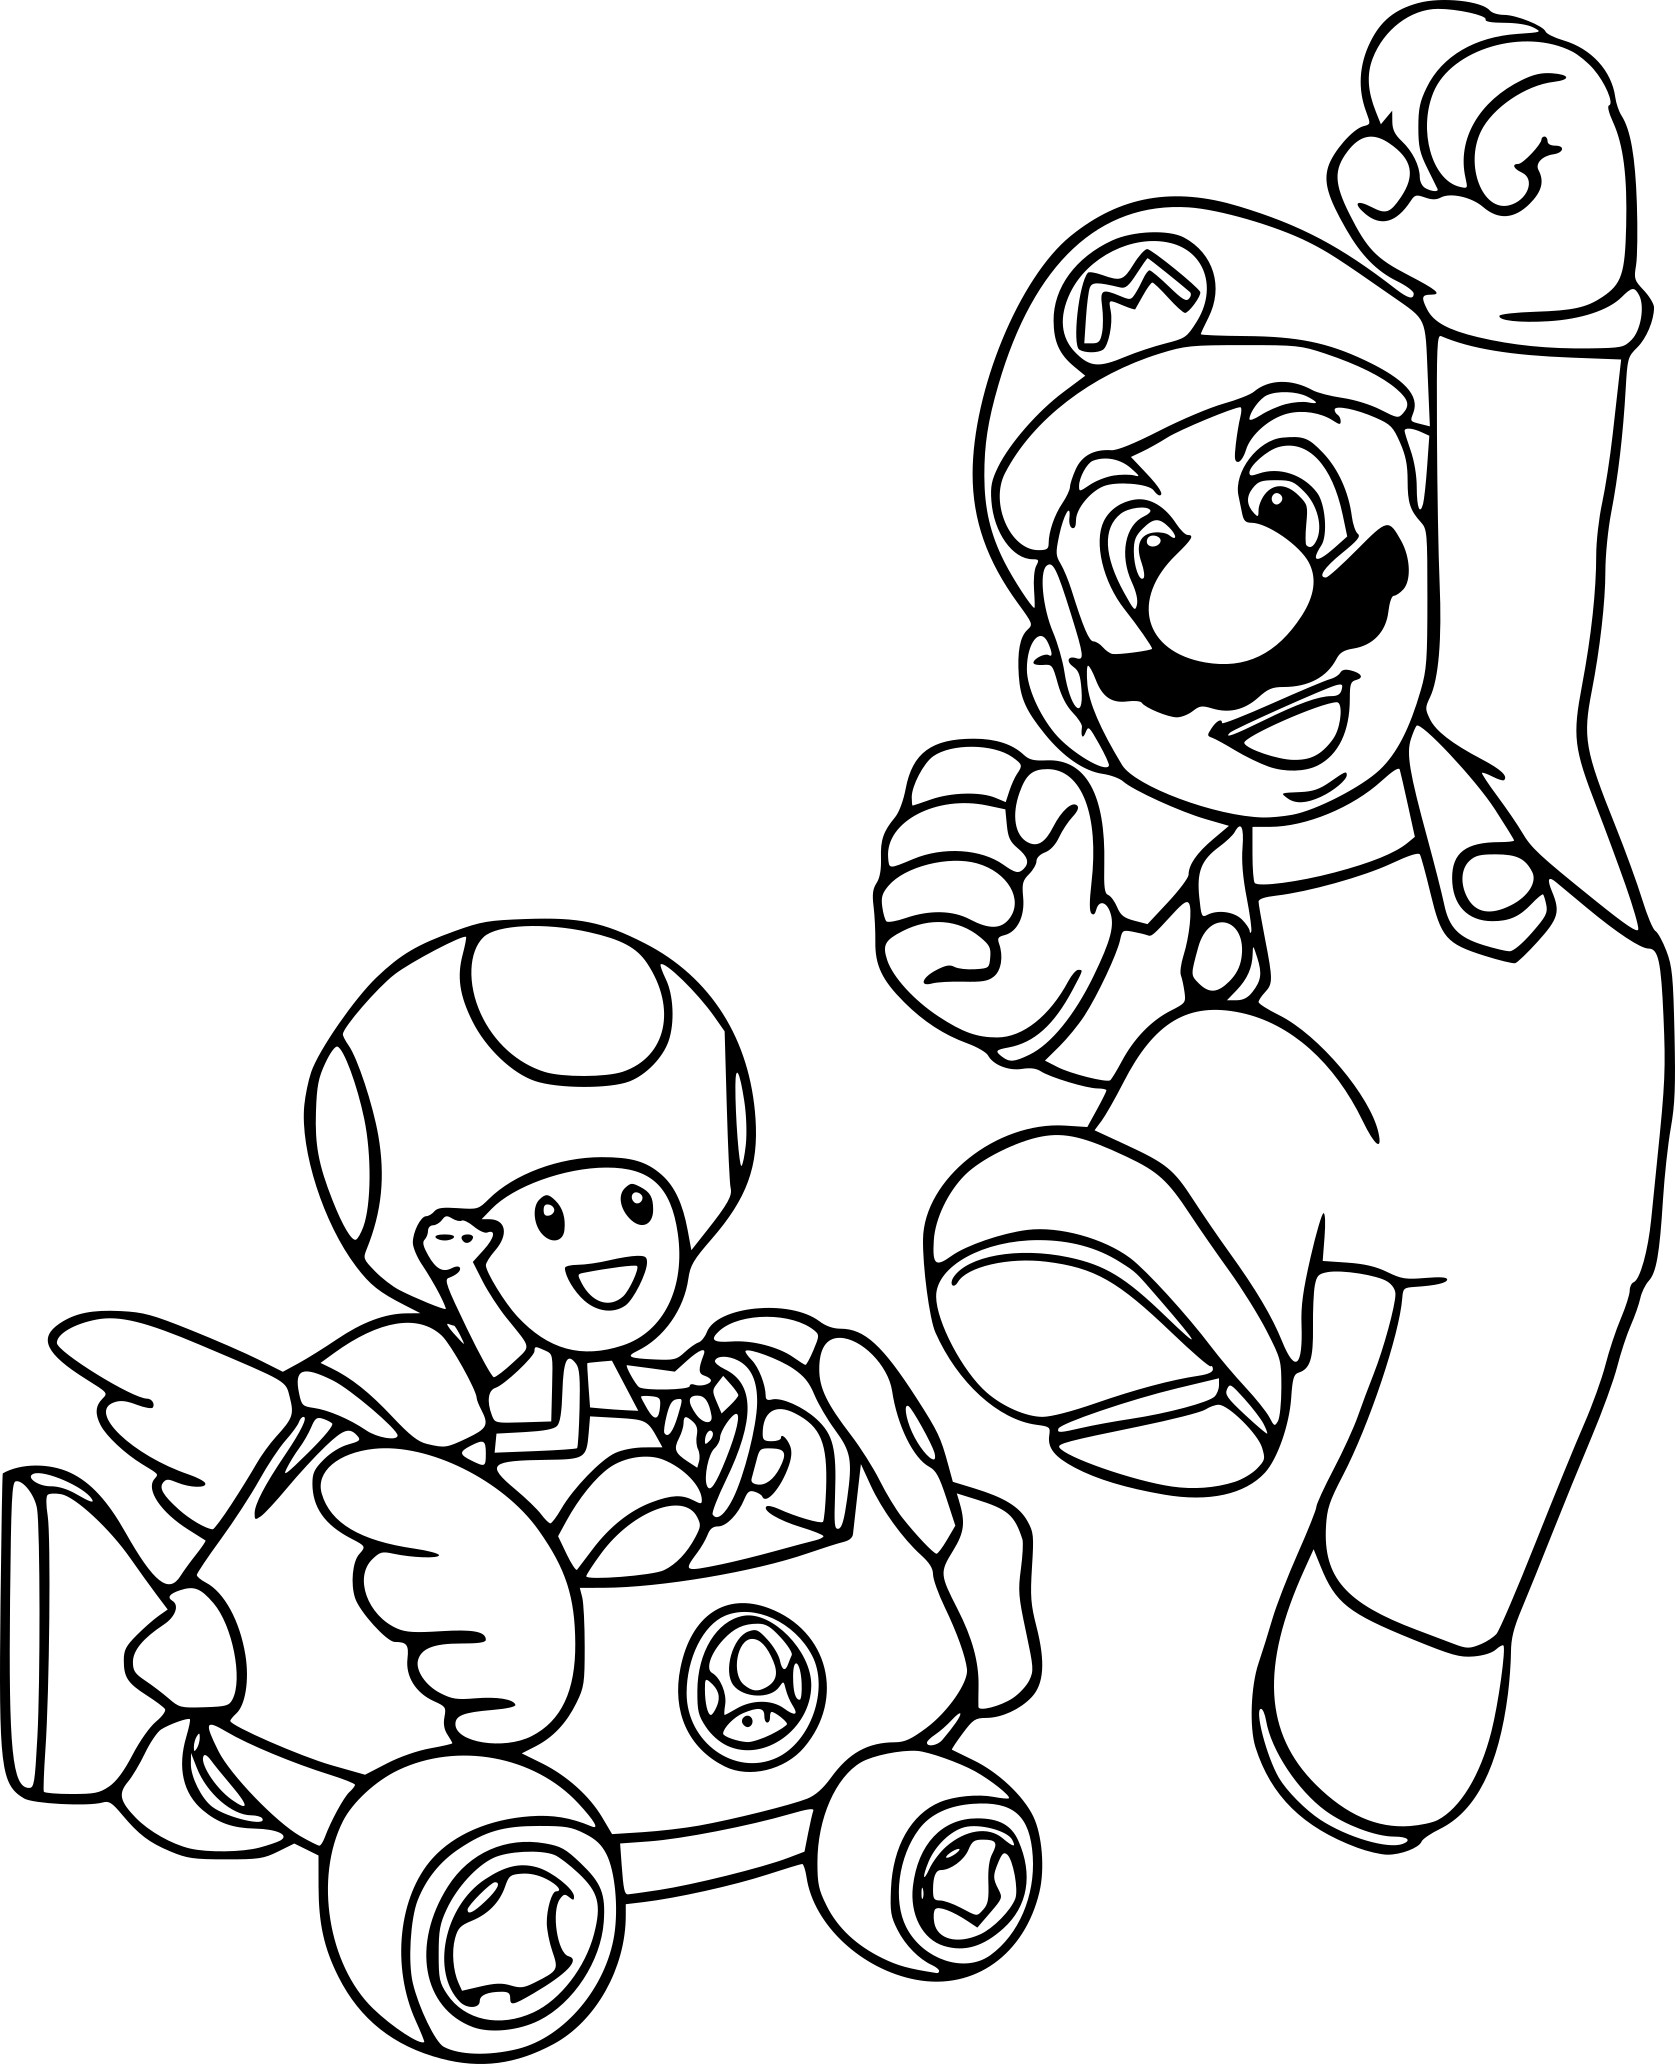 Coloriage Mario Et Toad A Imprimer